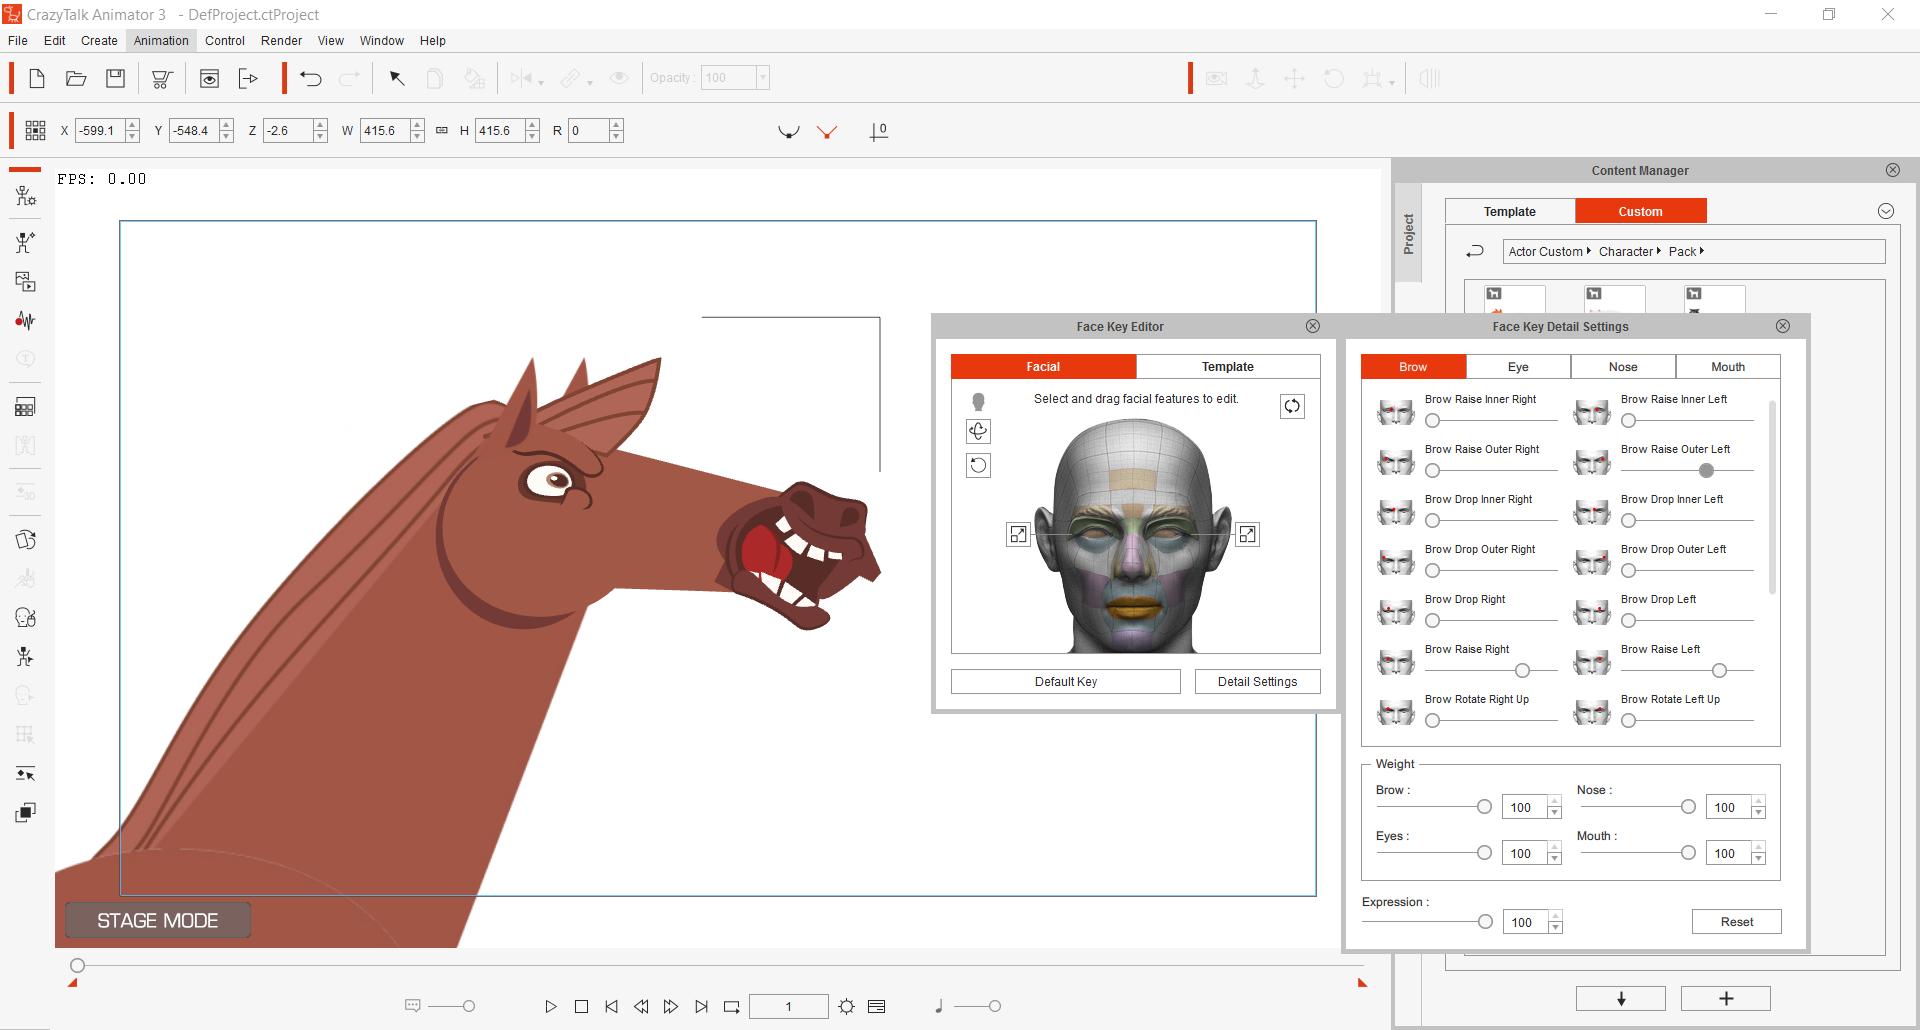 crazytalk-animator-4996_3_4996.png